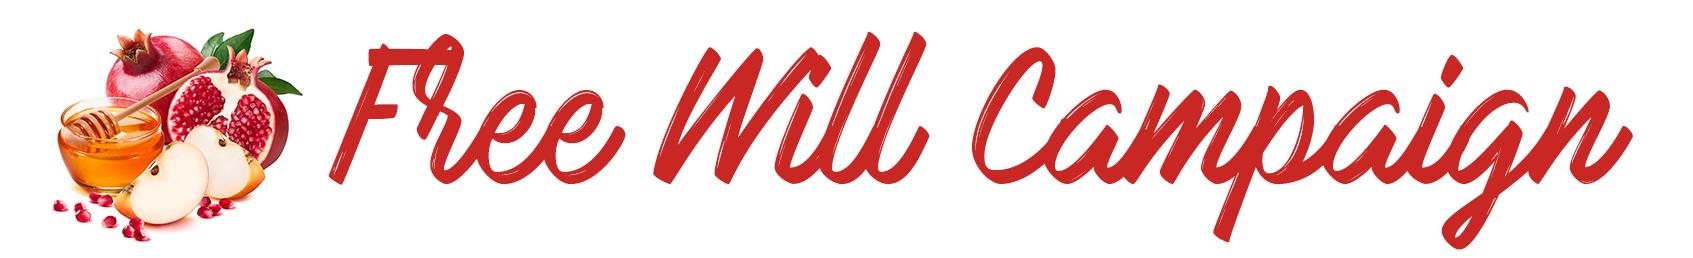 Free Will Campaign